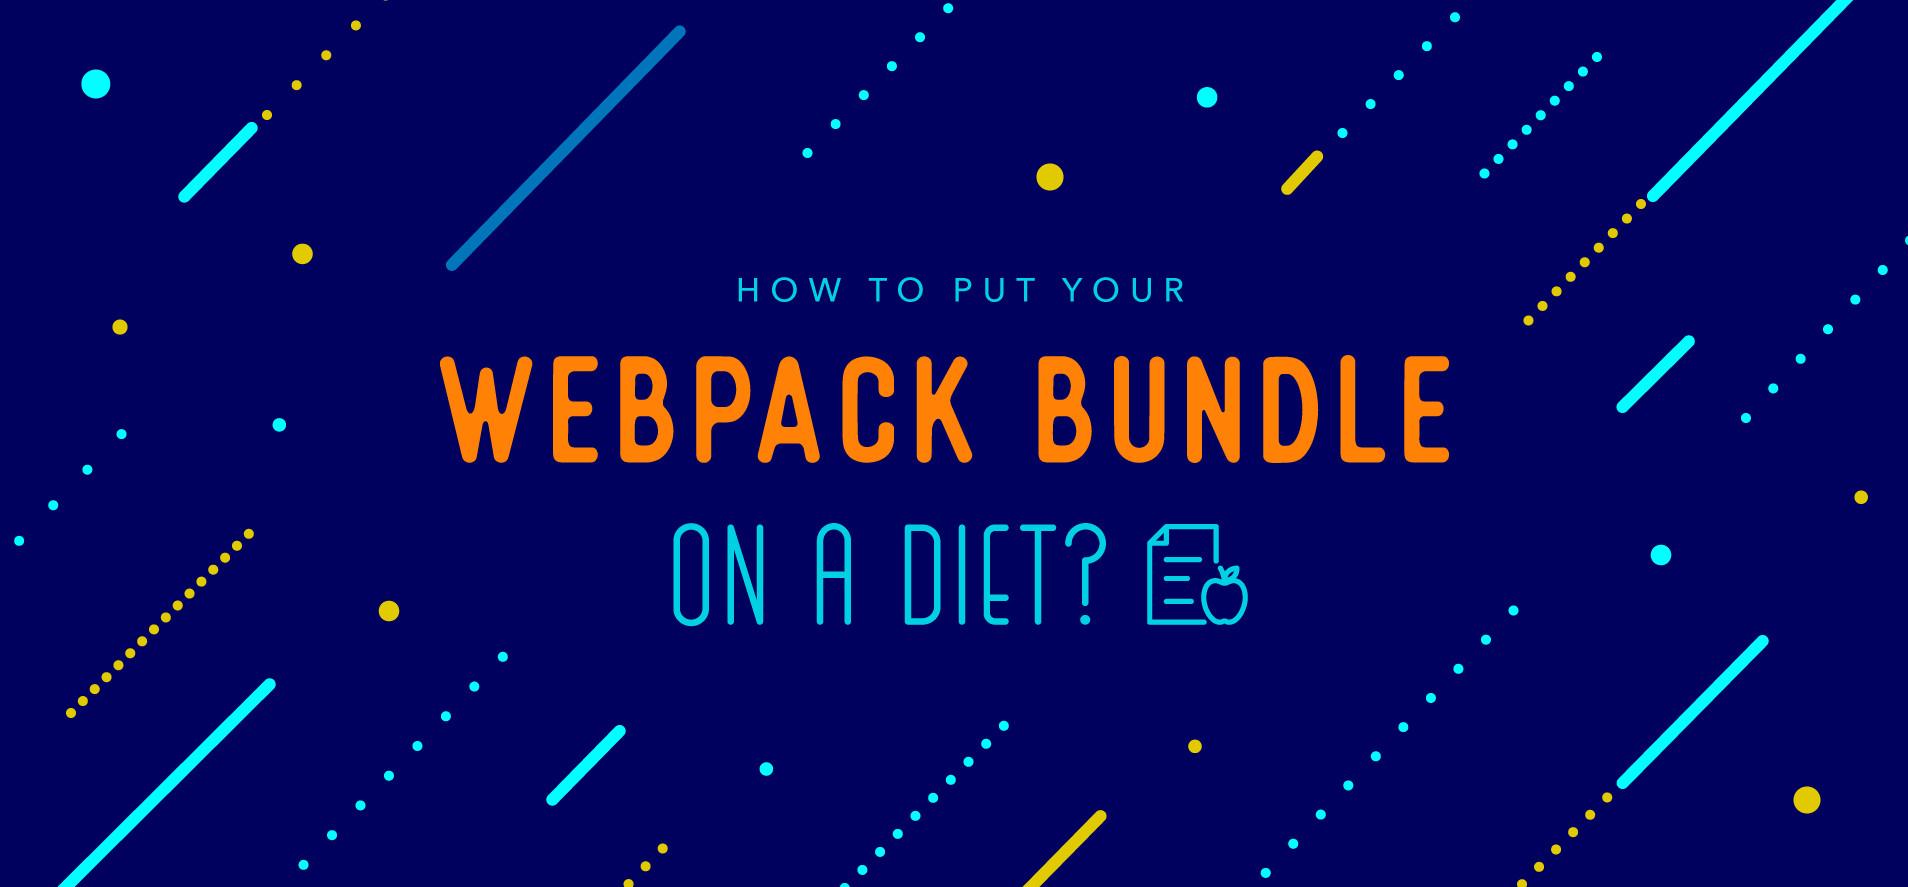 Put Your Webpack Bundle On A Diet - Part 4 | Contentful